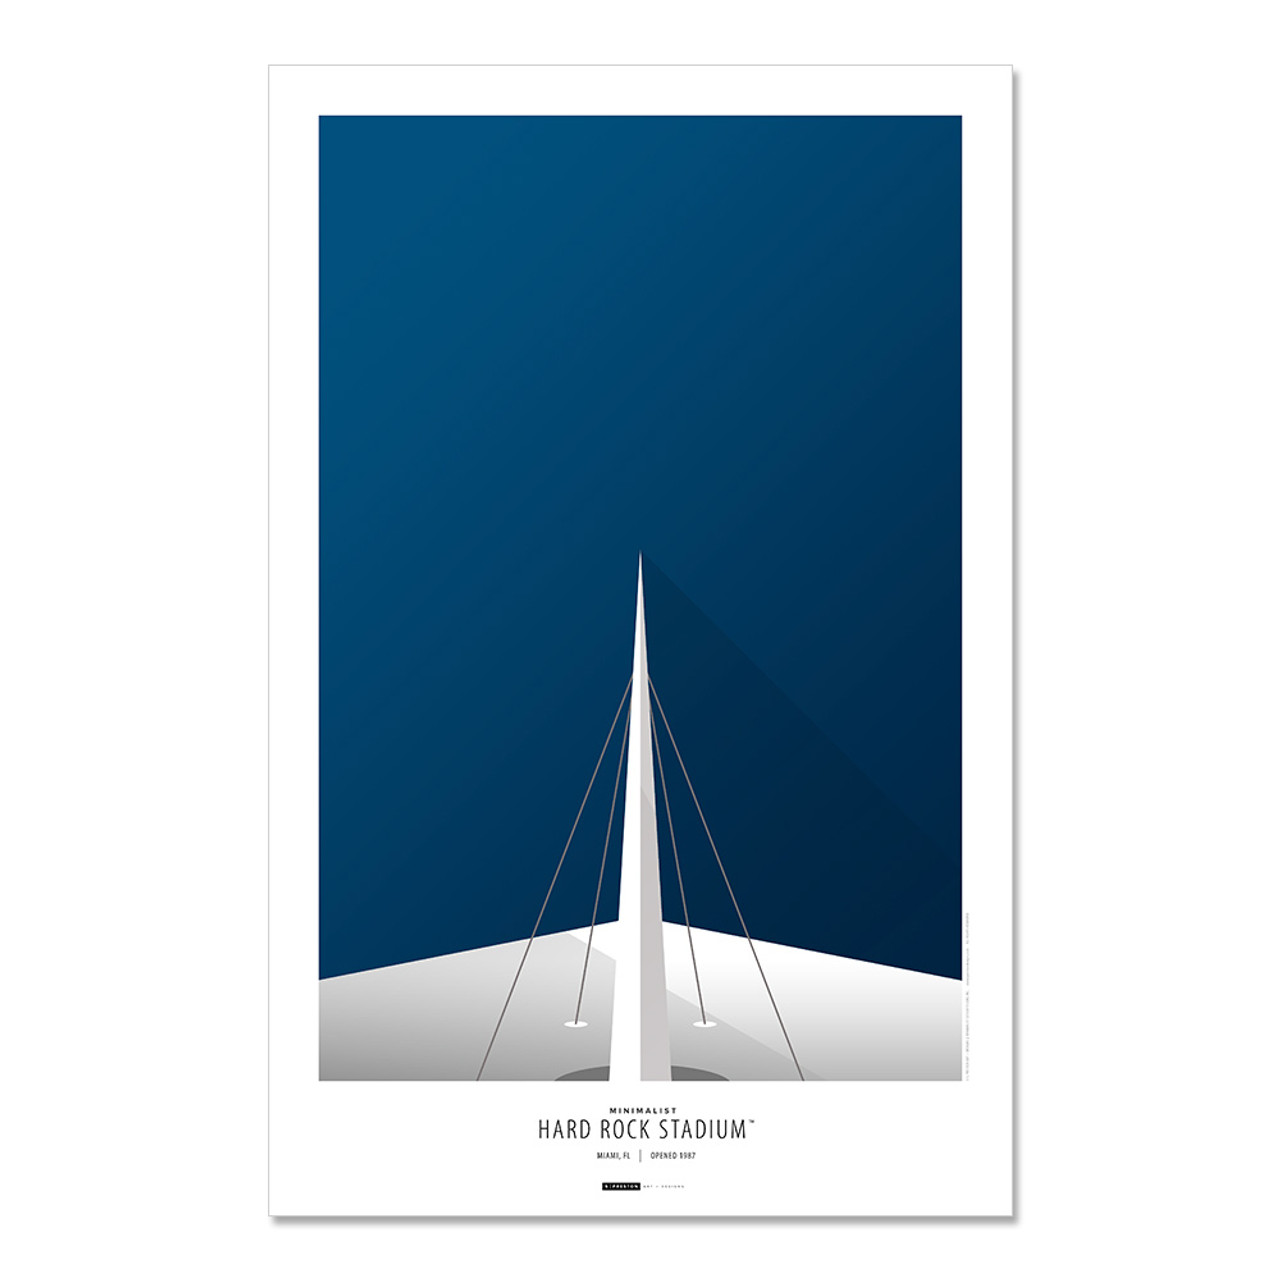 Miami Dolphins -Hard Rock Stadium Art Poster